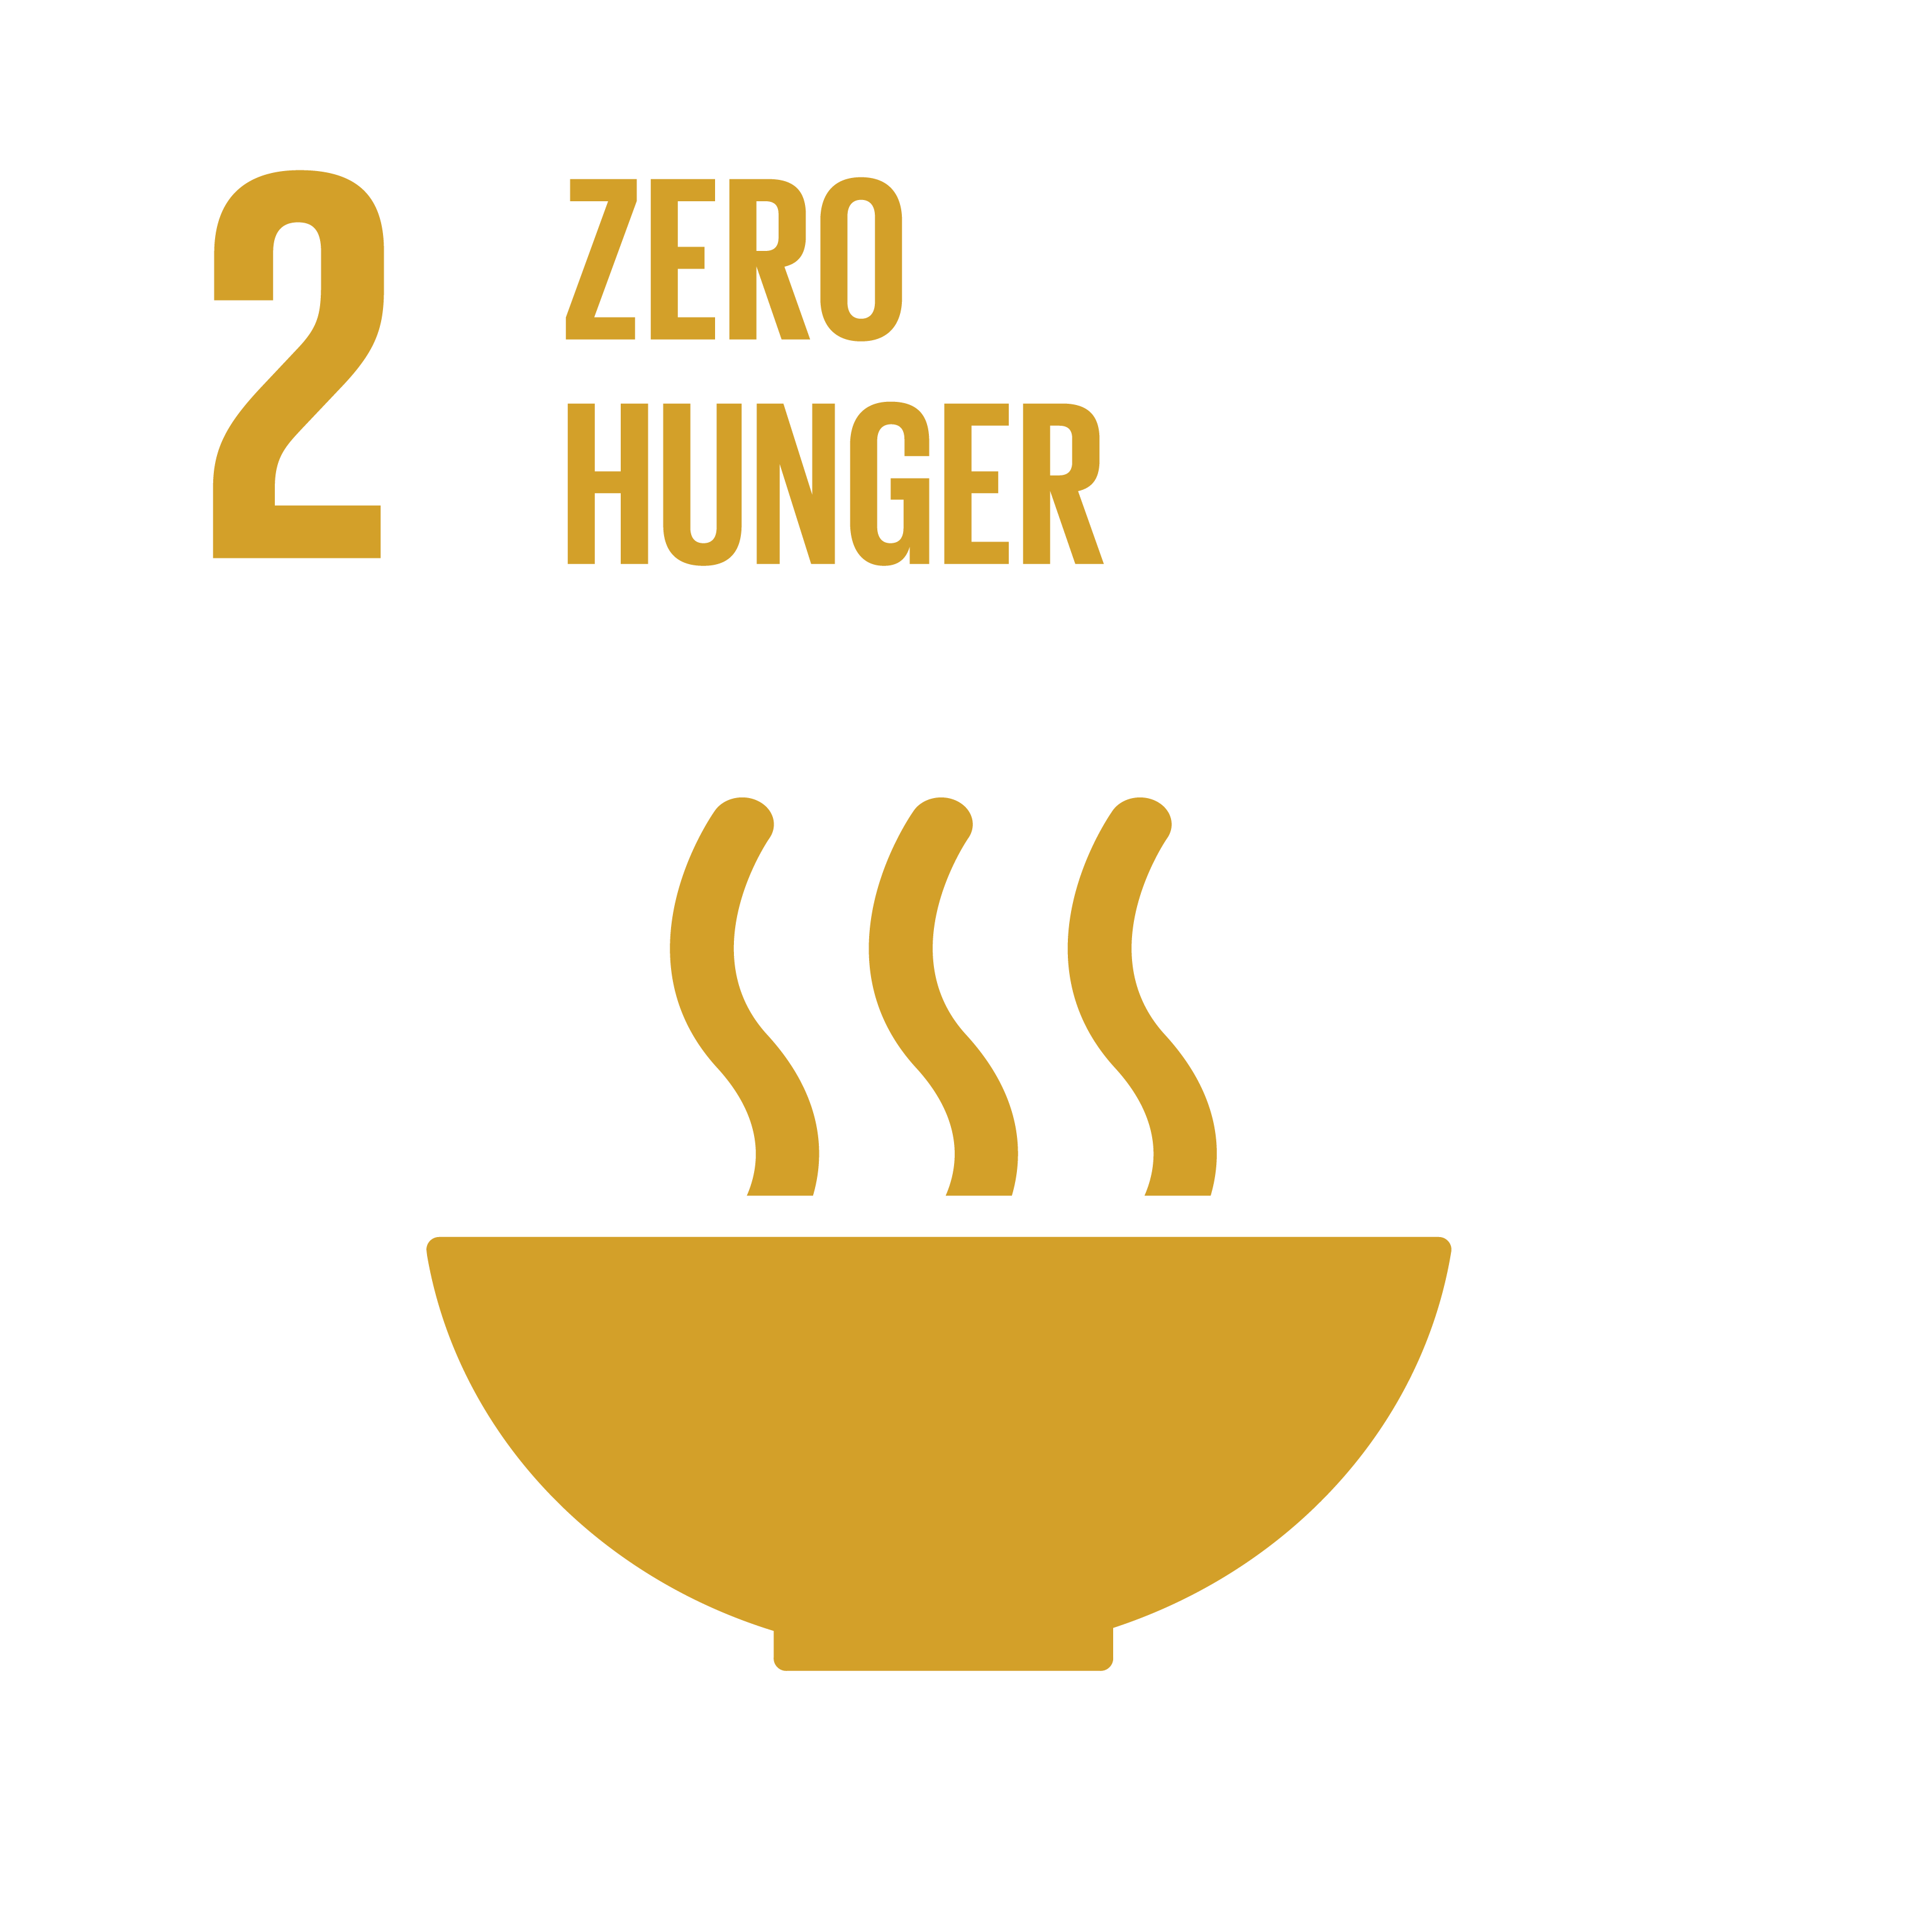 Sustainable Development Goals 02 zero hunger